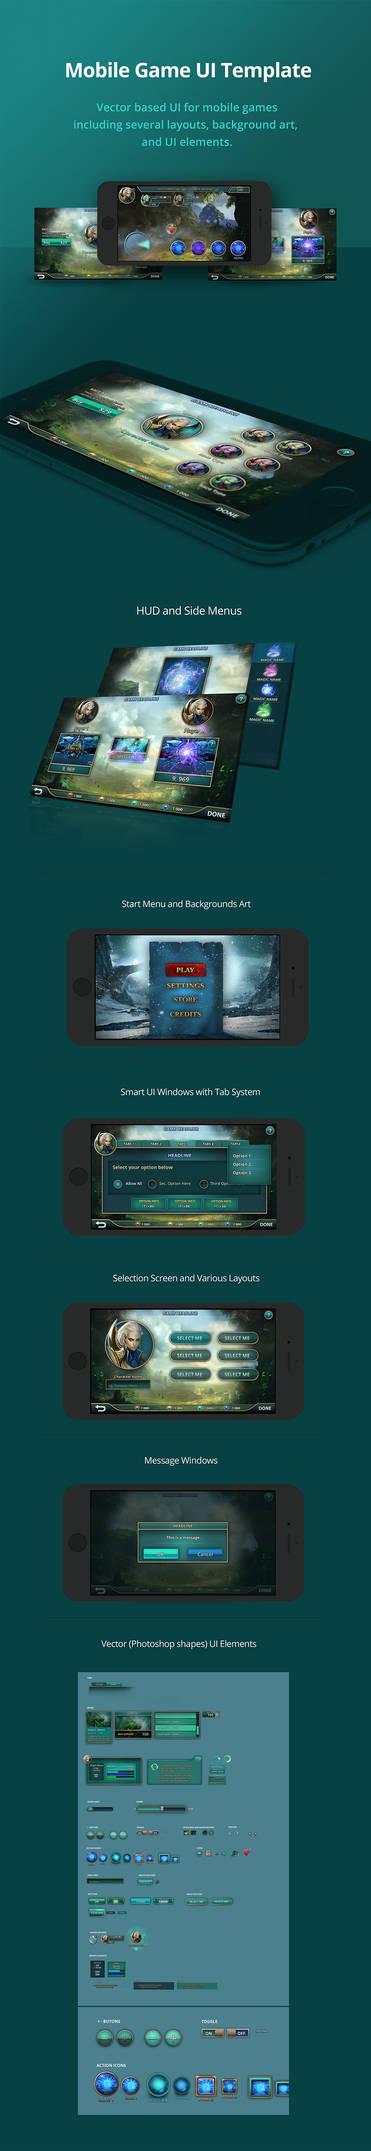 Mobile-game-ui